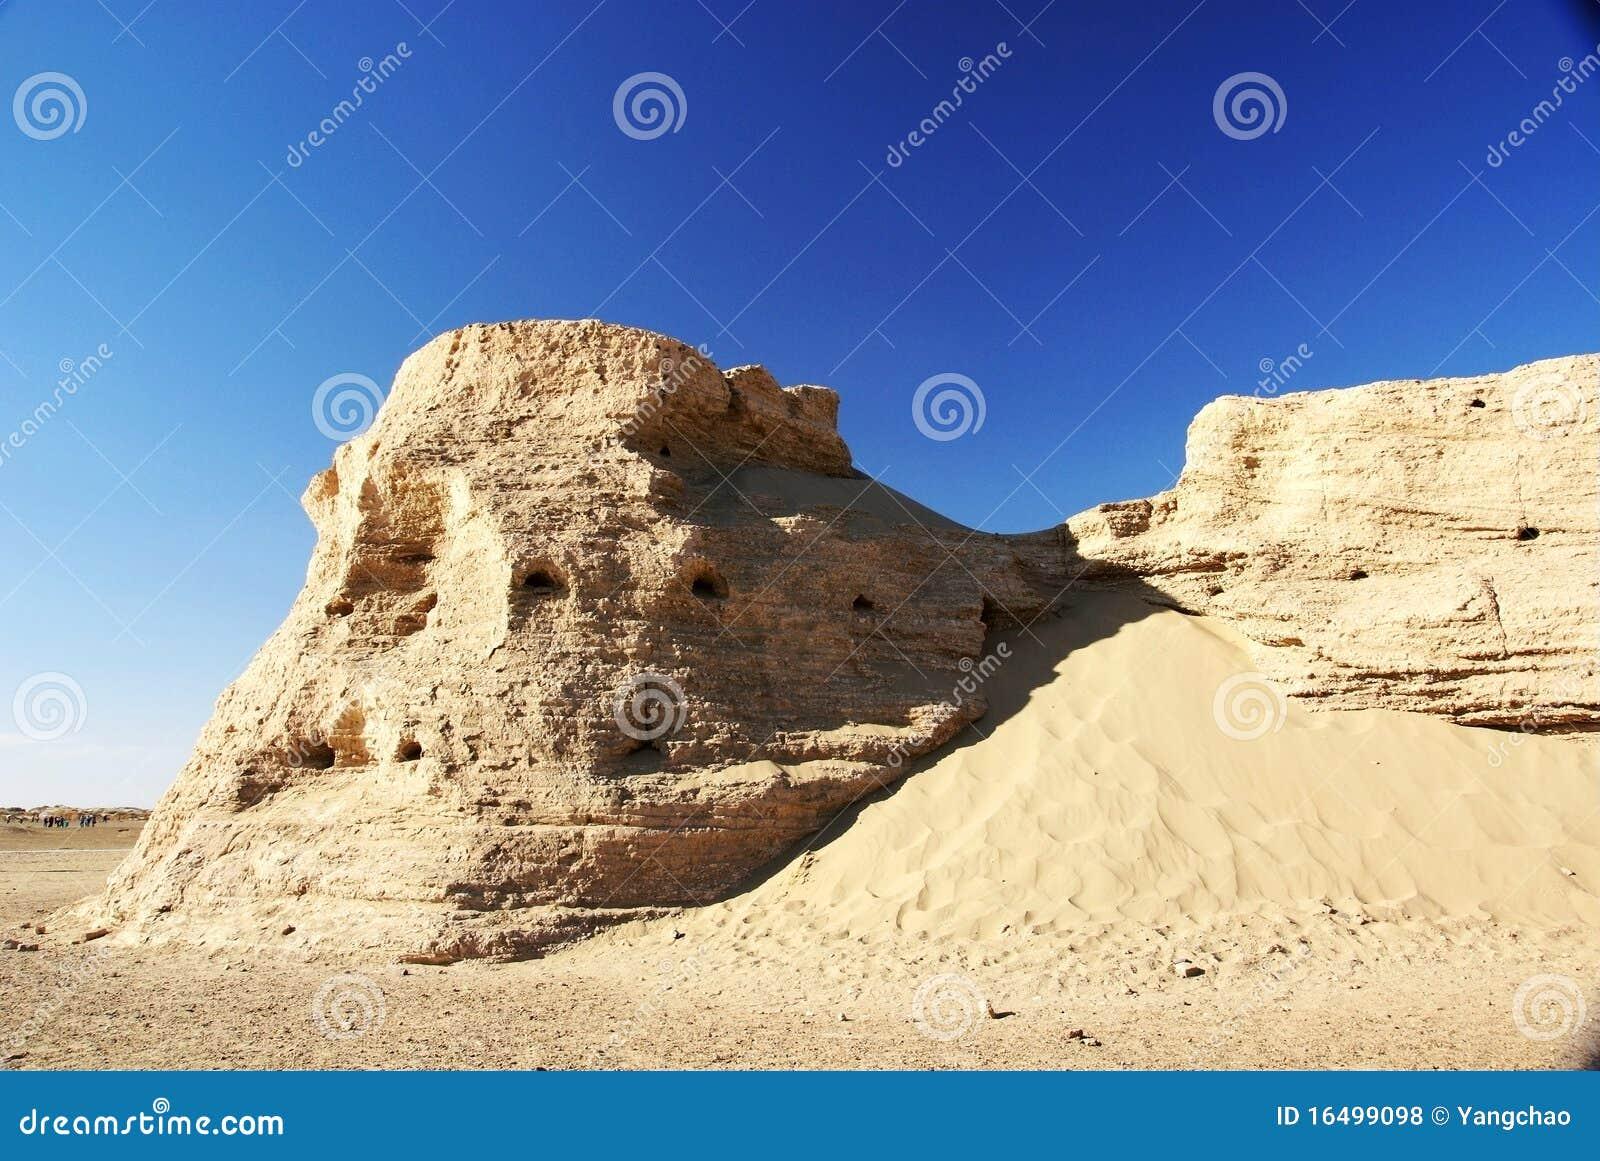 Rotten ancient city wall